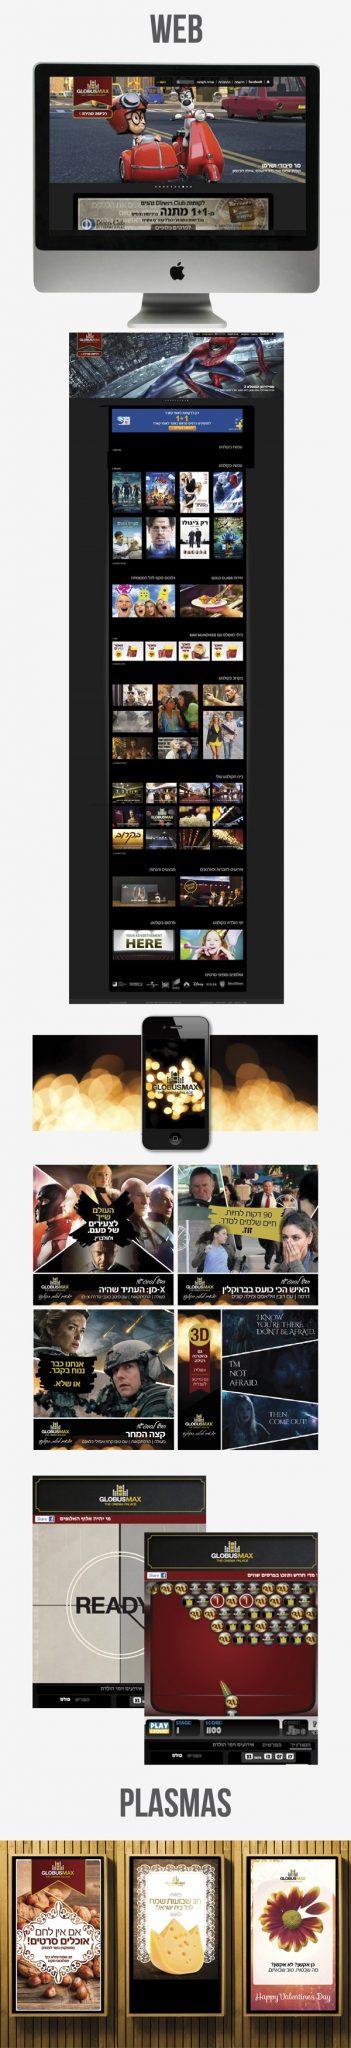 cinema branding, logo, website, app, internet, facebook